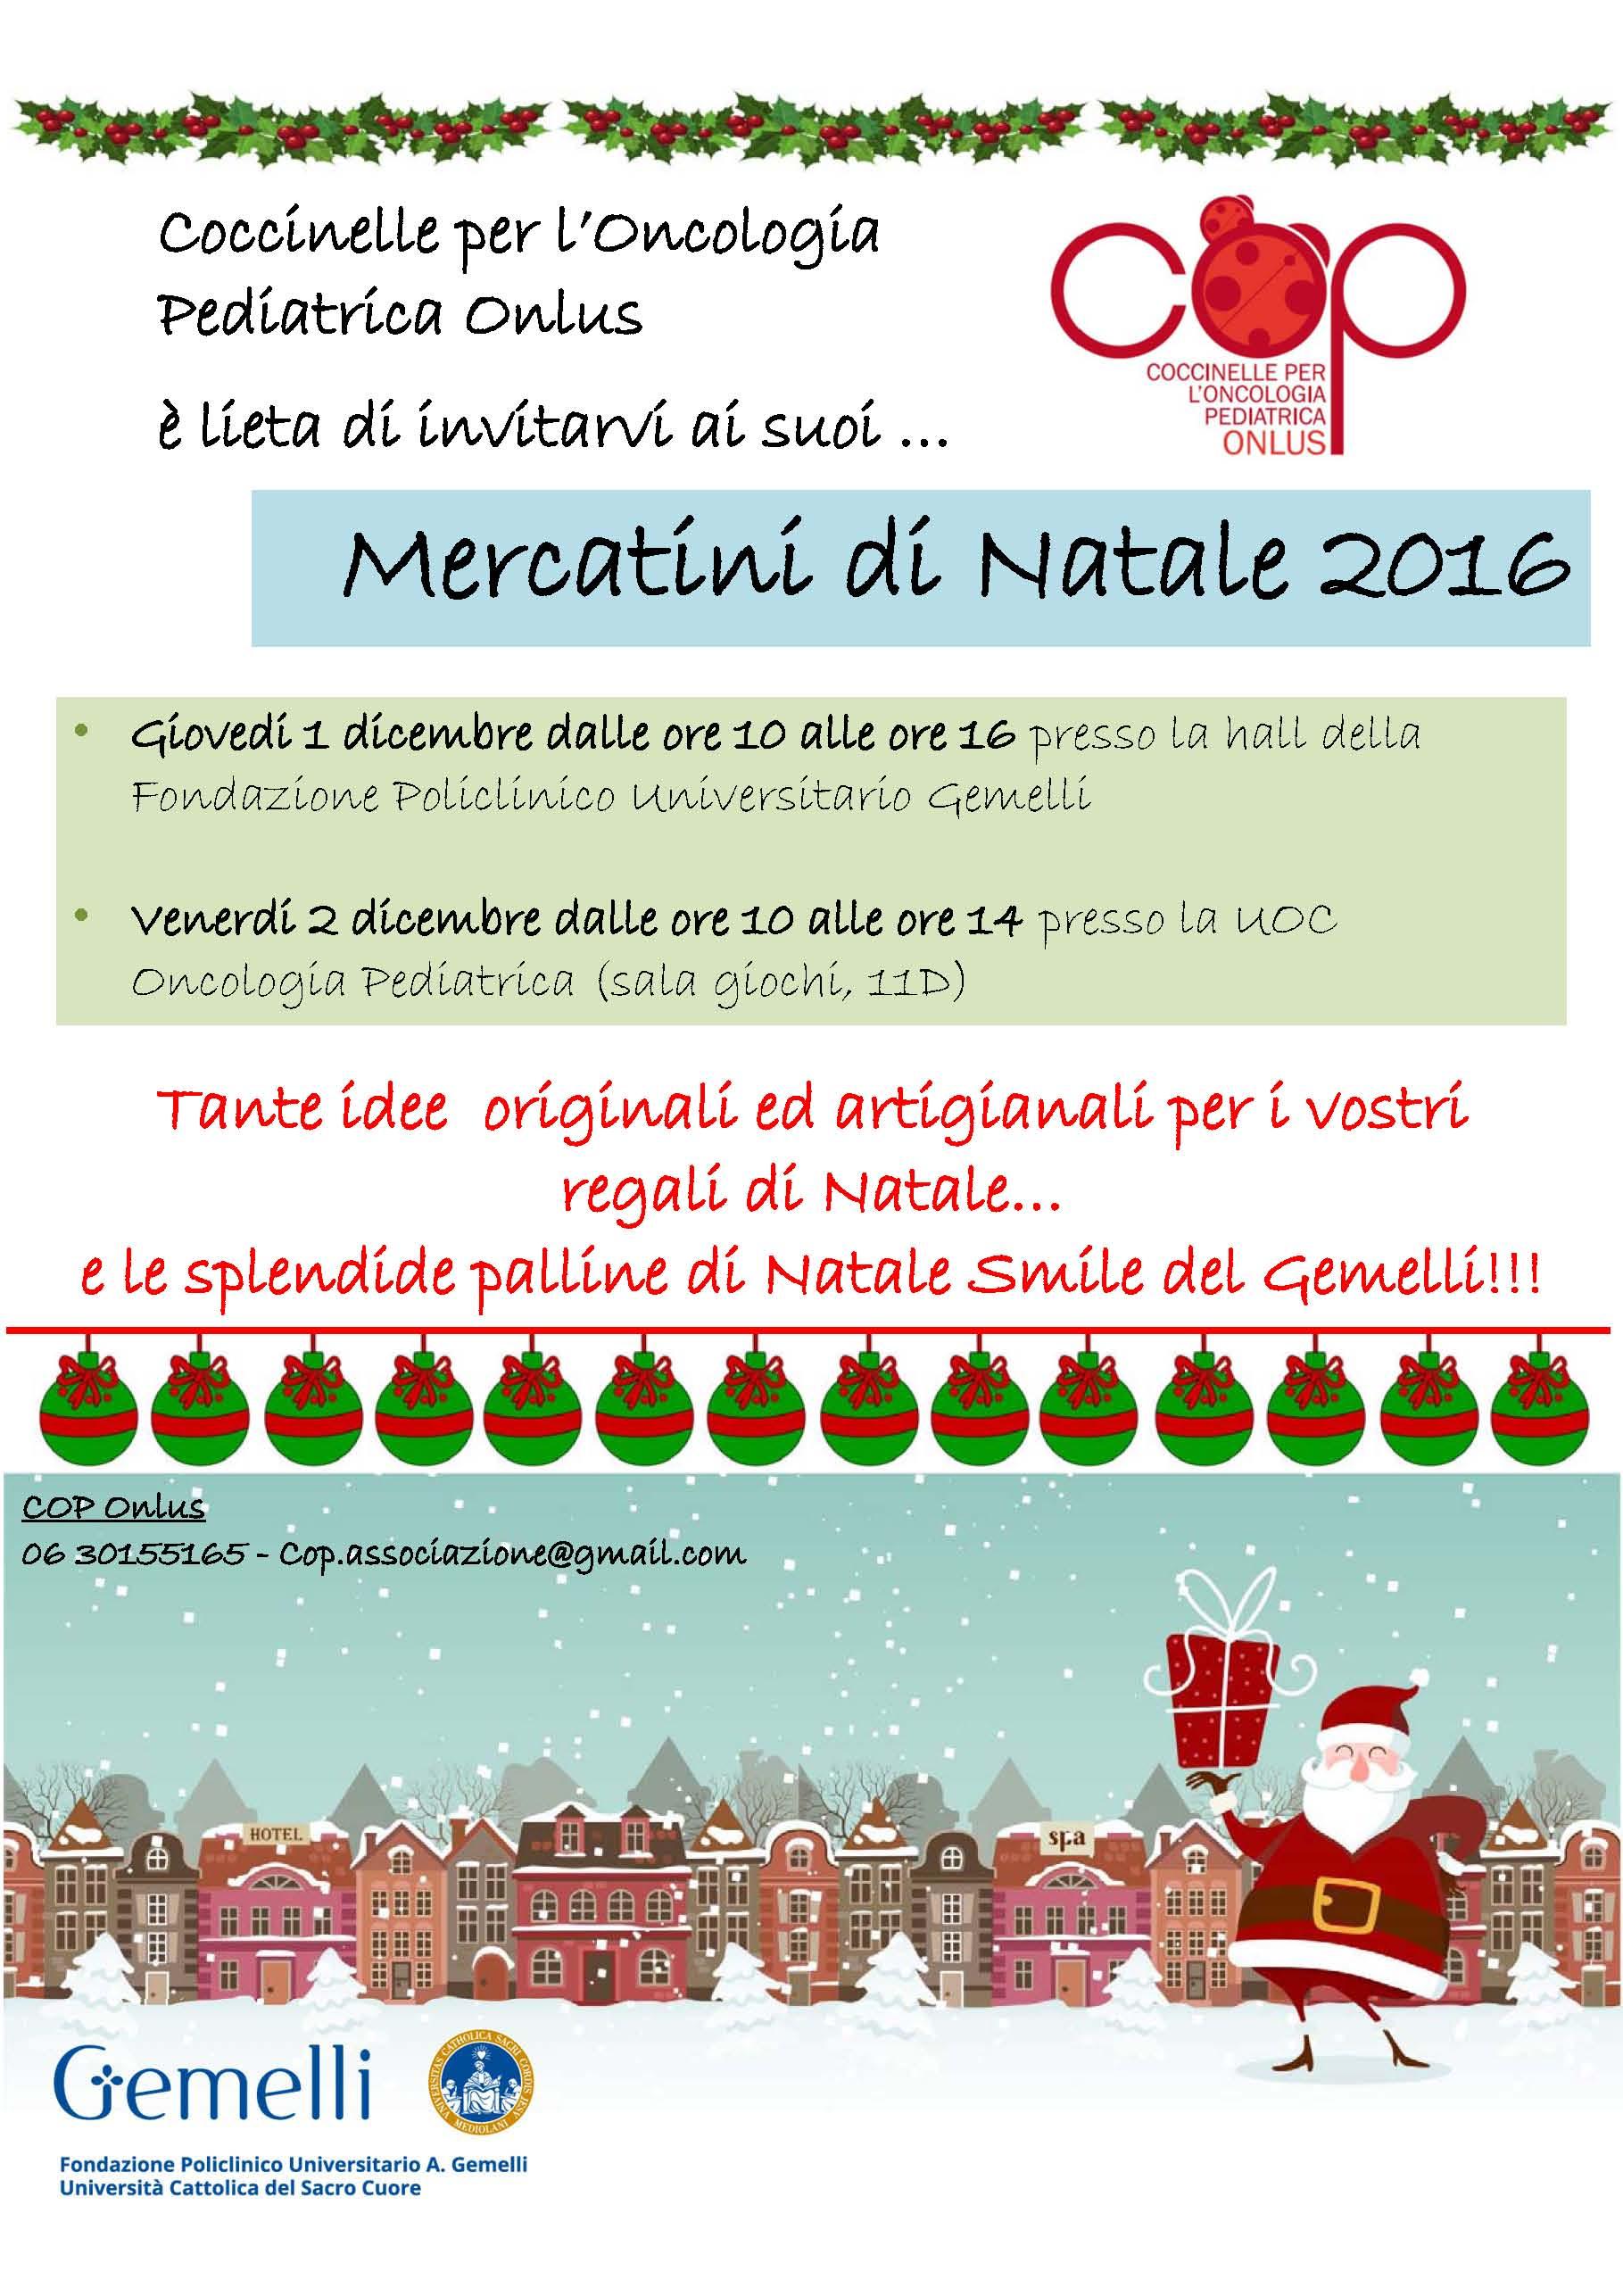 Regali Di Natale Onlus.Cop Coccinelle Per L Oncologia Pediatrica Onlus Tornano I